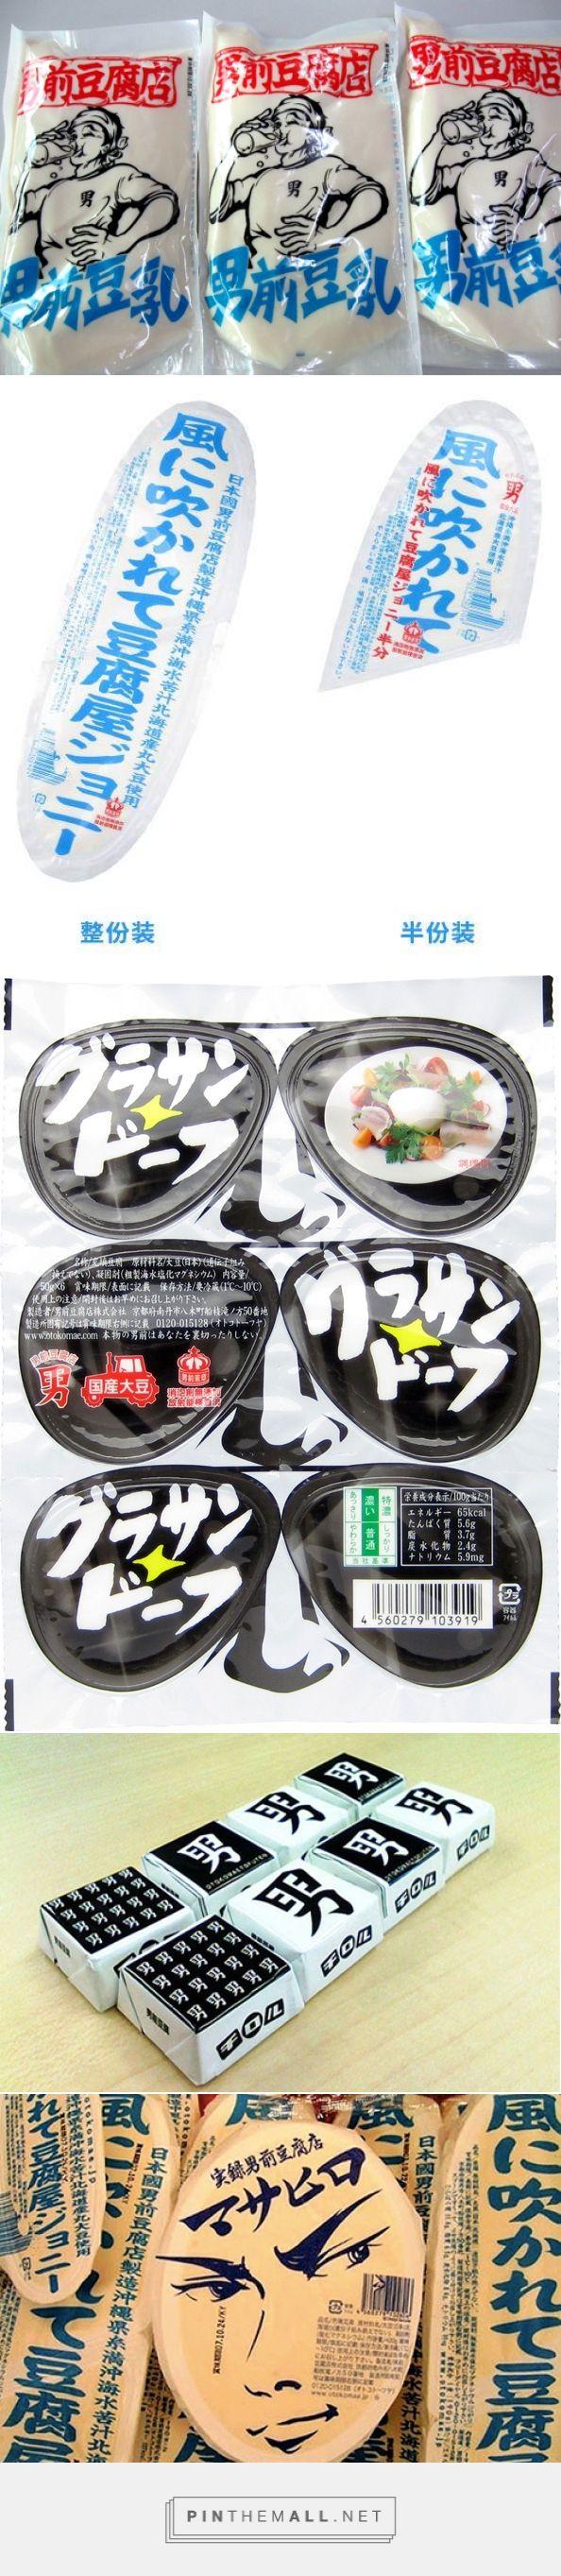 日本男前豆腐店:原來帥,真的可以大賣...... - ㄇㄞˋ點子靈感創意誌 Cool #packaging from Mr. Tofu Man curated by Packaging Diva PD created via http://www.mydesy.com/handsome-tofu-man